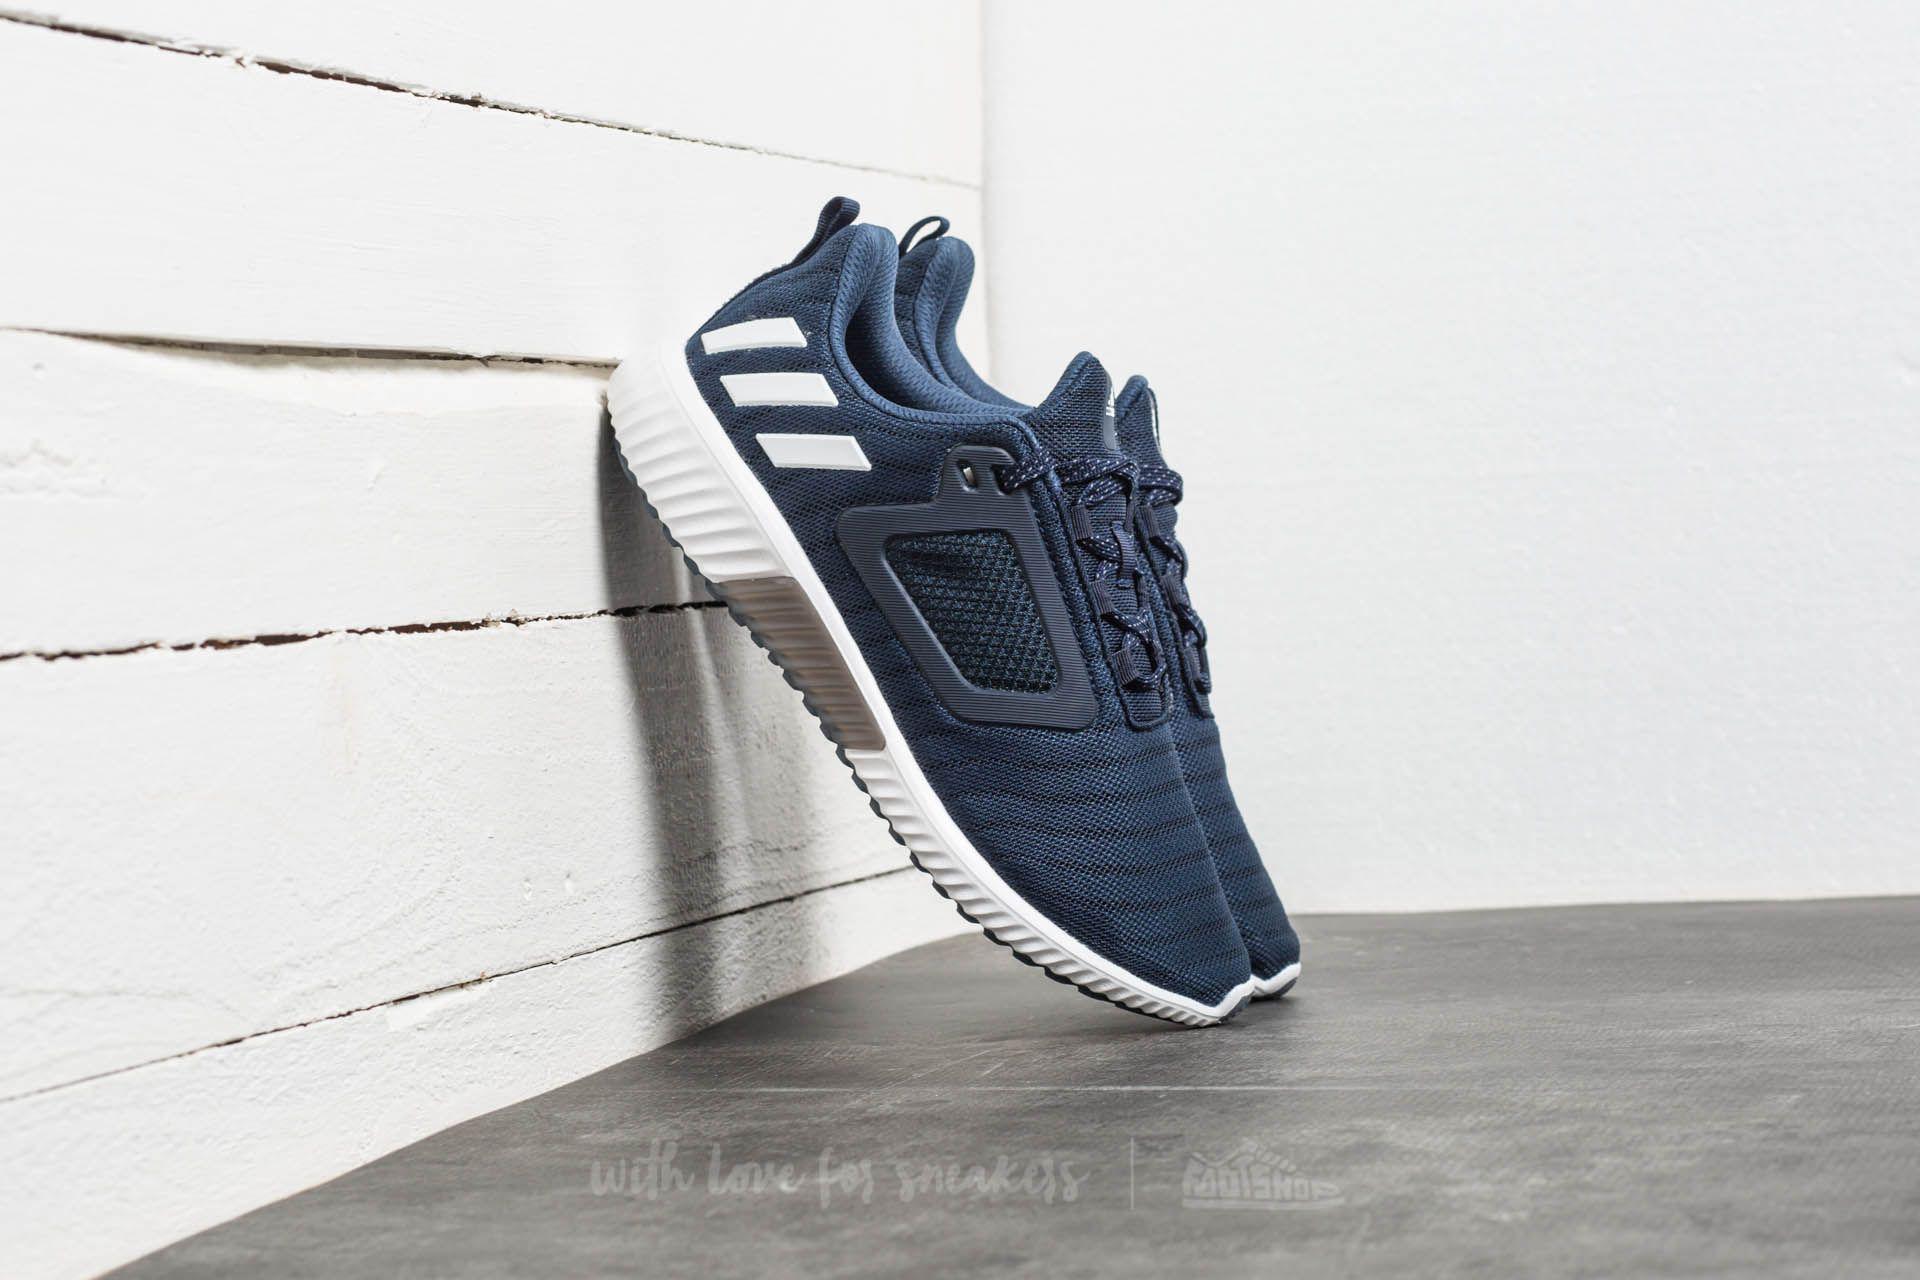 Lyst adidas Originals Adidas ClimaCool CW Collegiate Navy / FTW